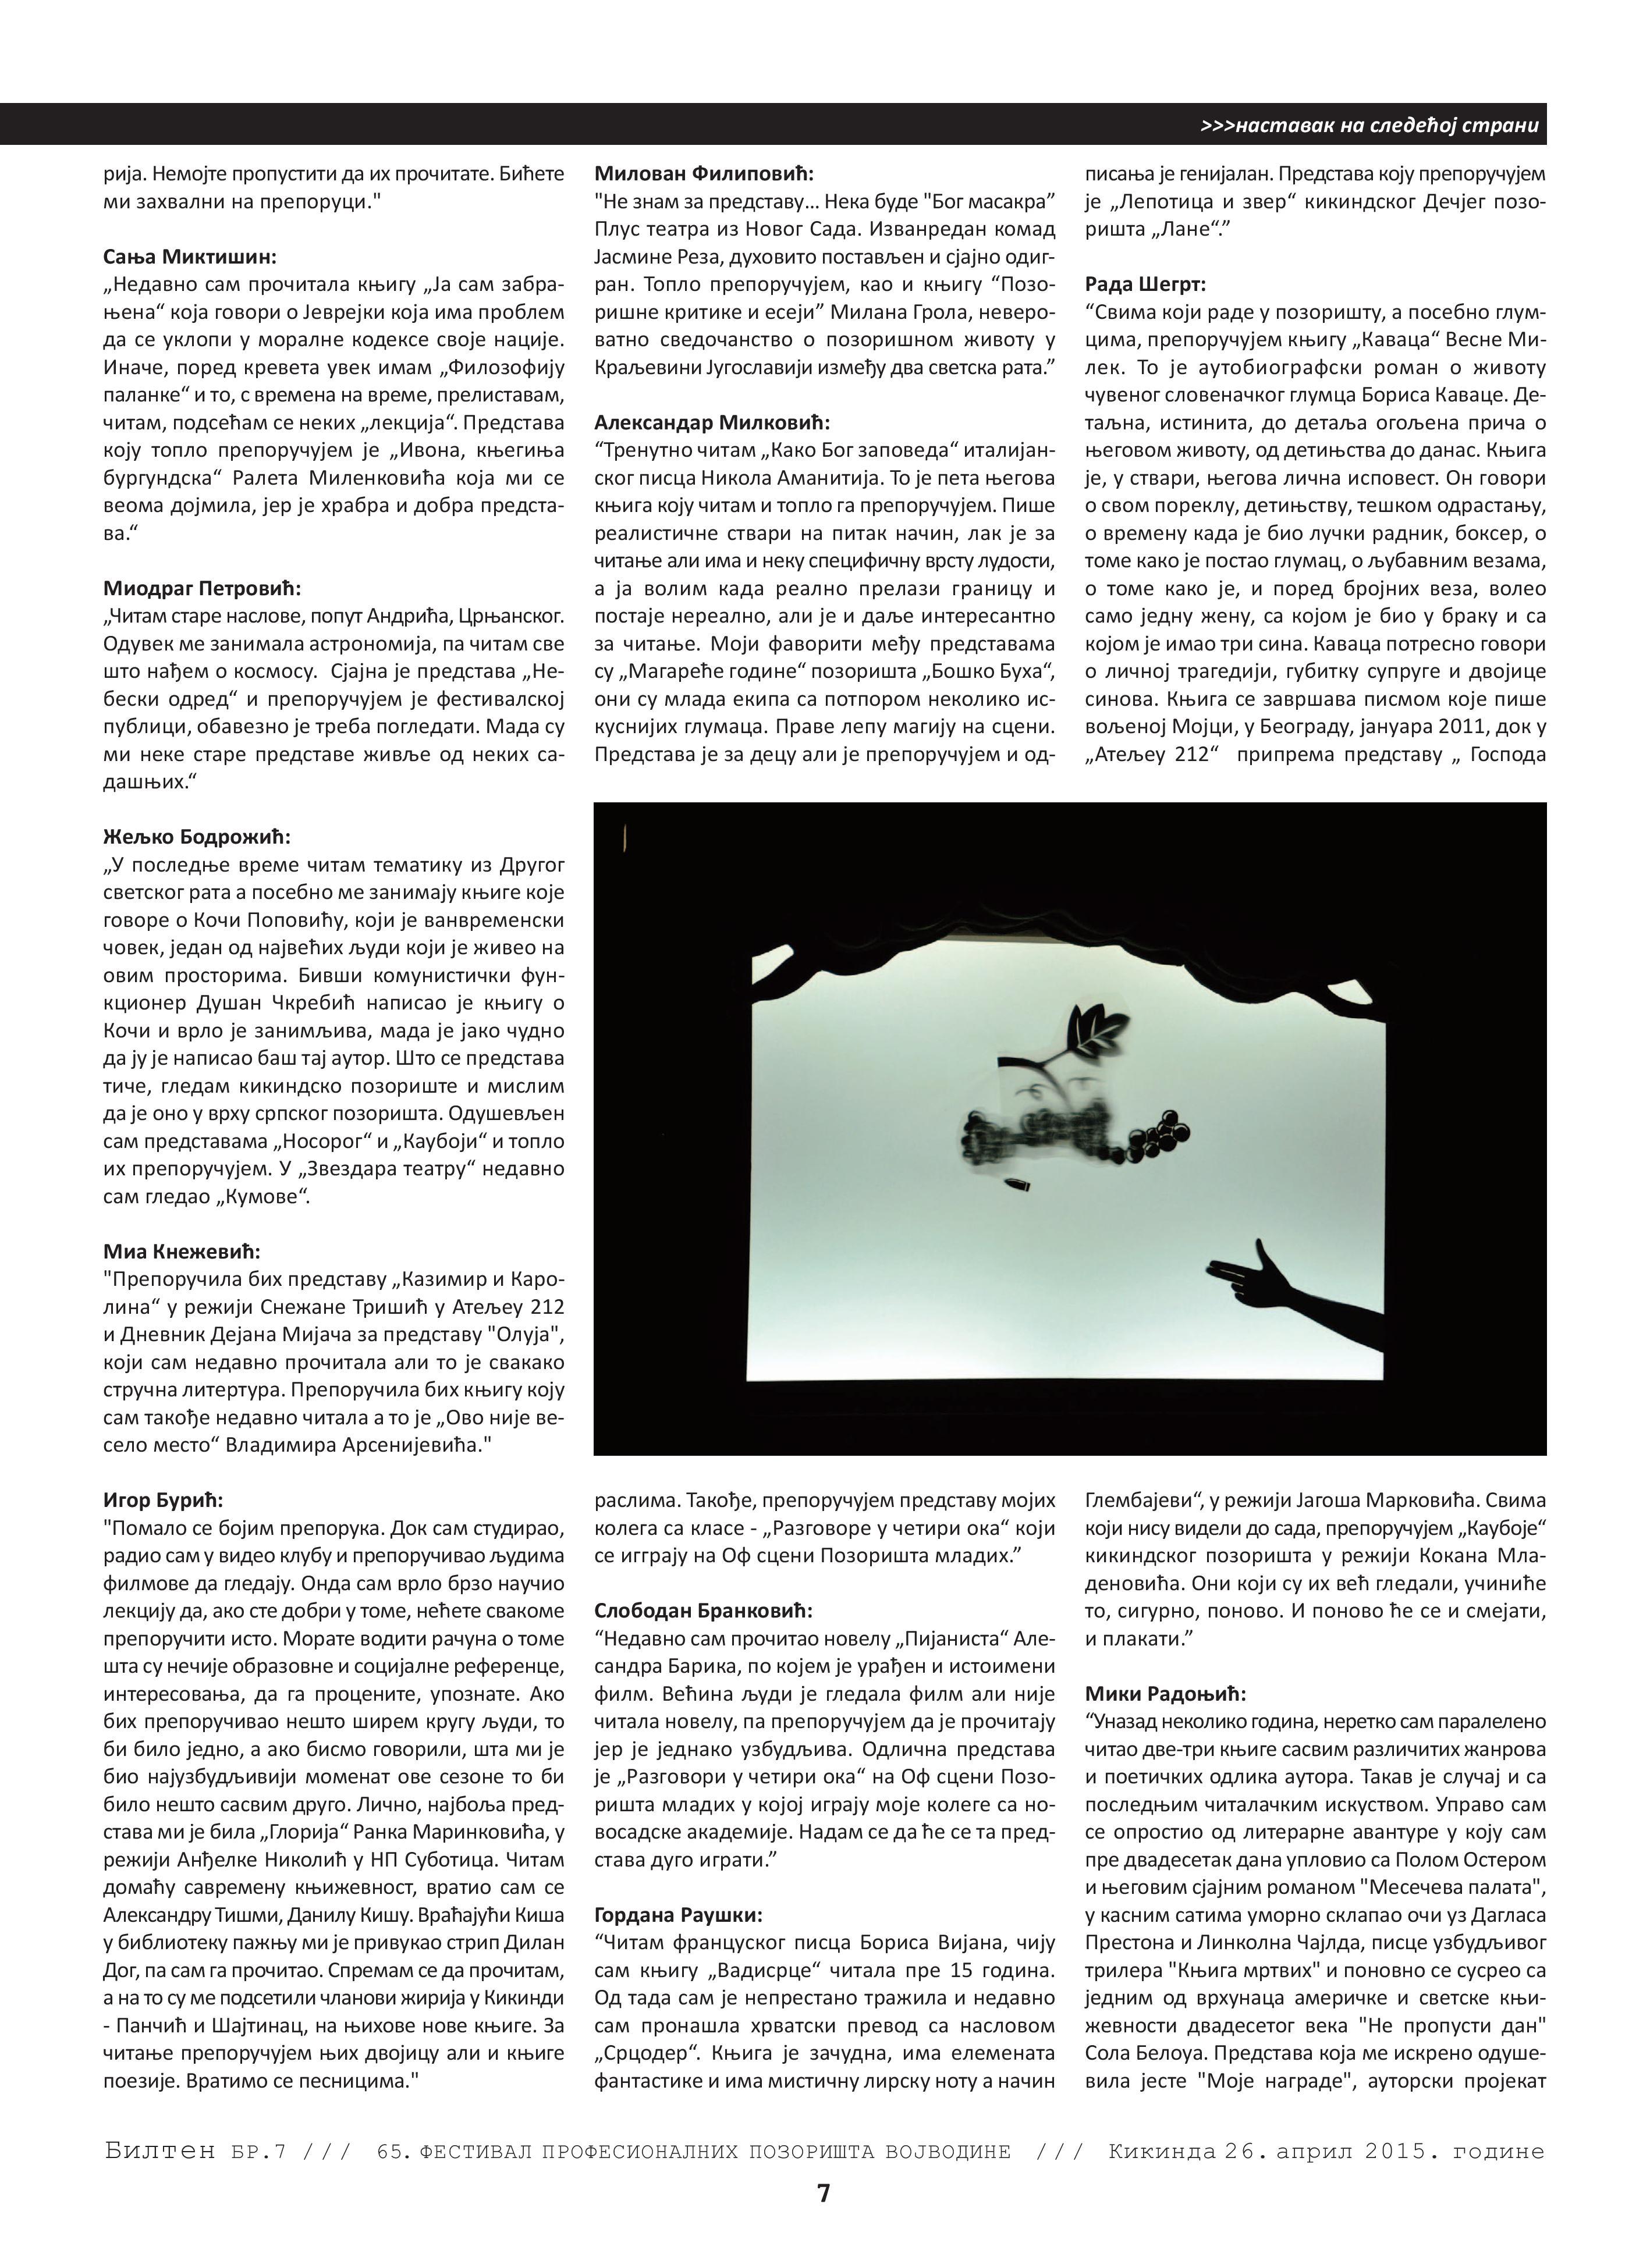 BILTEN_07_26 april_2015-01-page-007